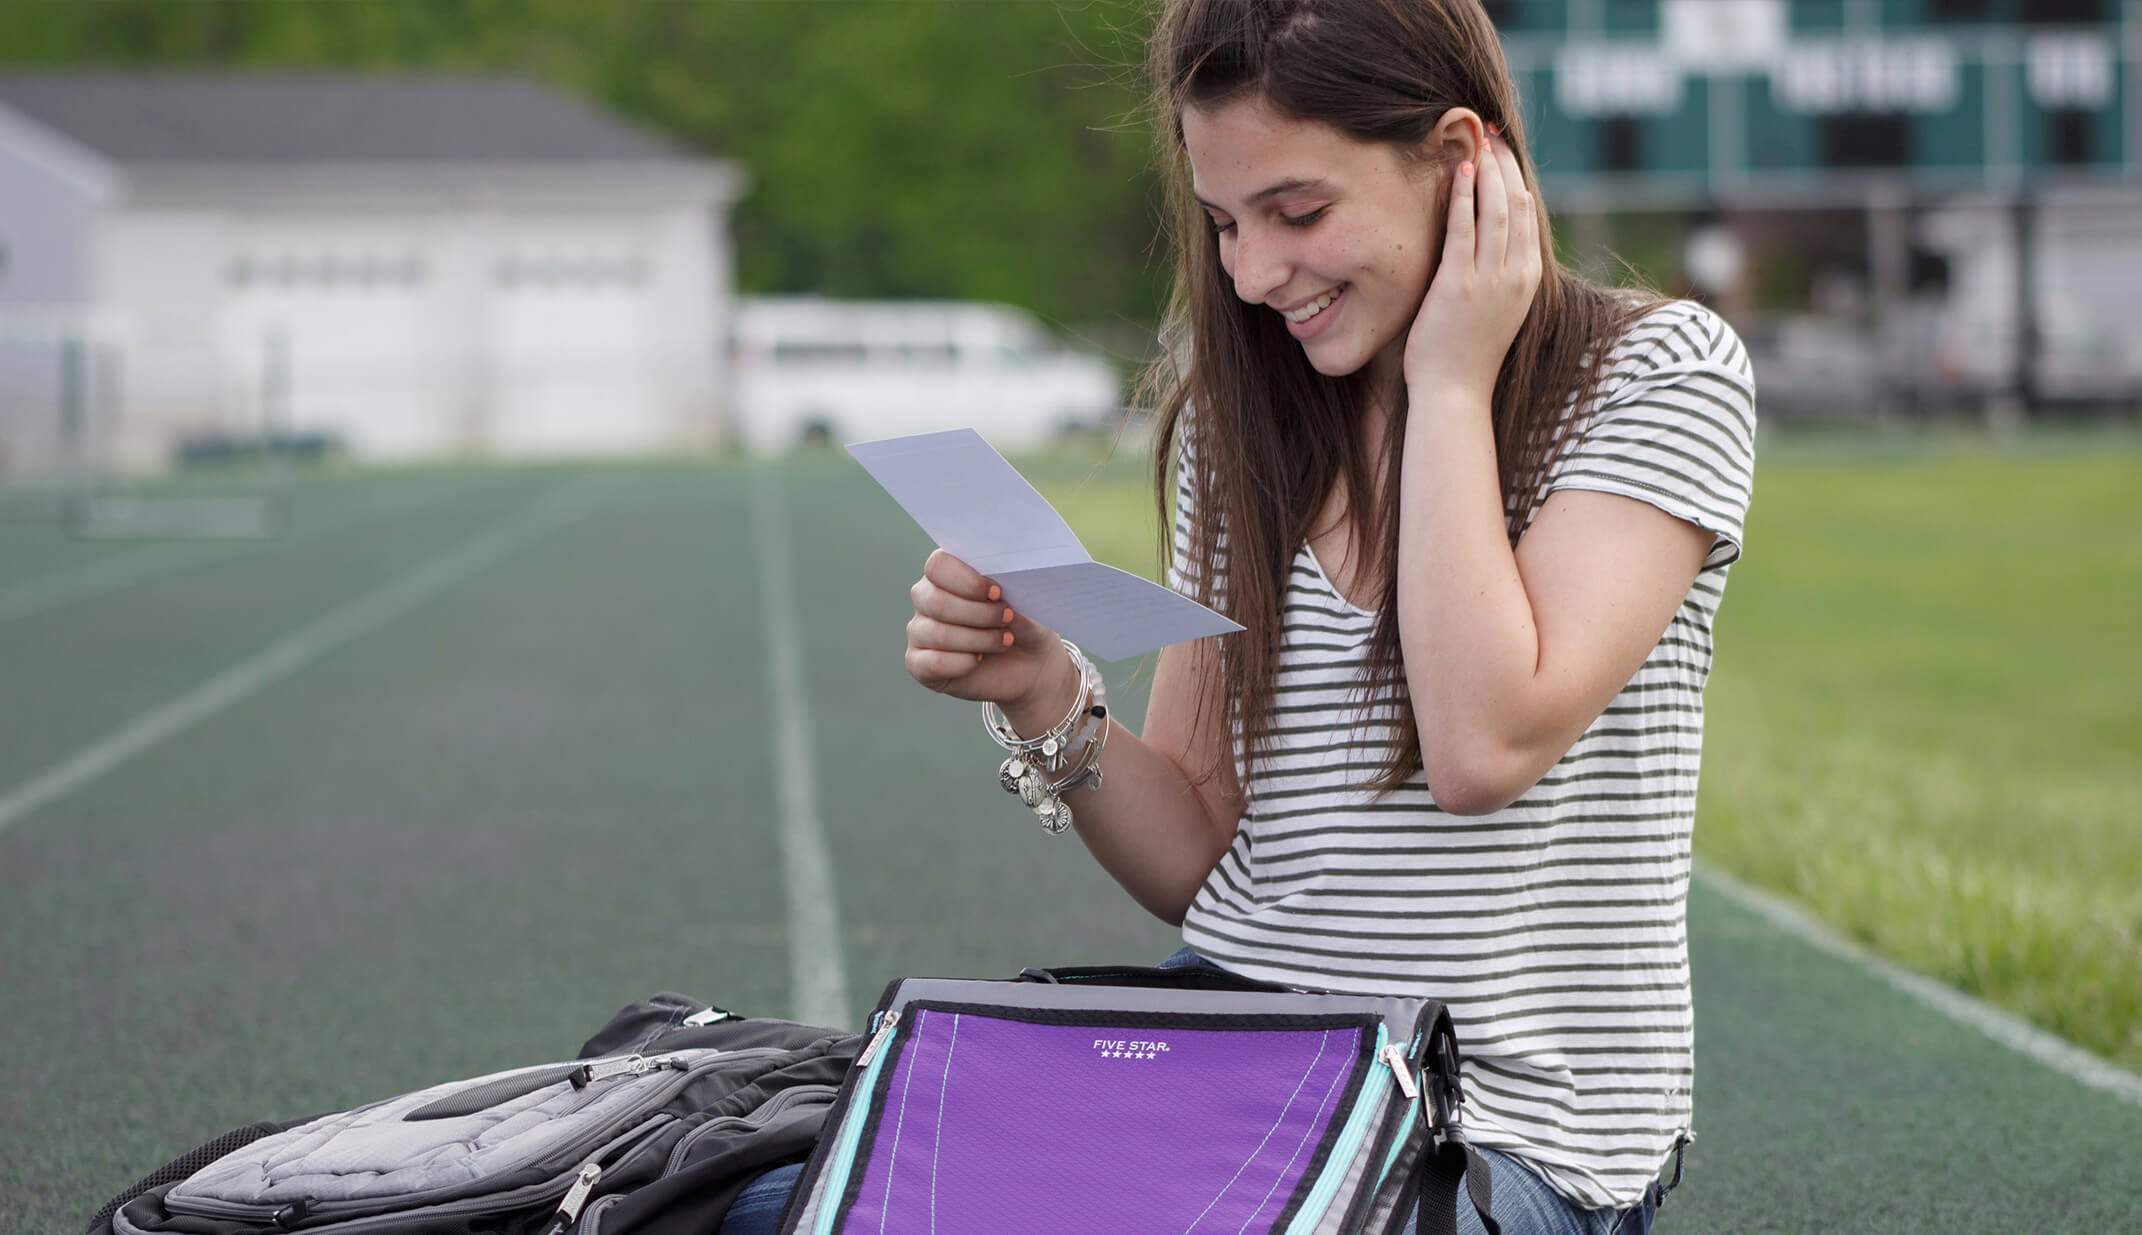 natural smile real girl smiling holding binder notes school branded UGC content shirt stripes